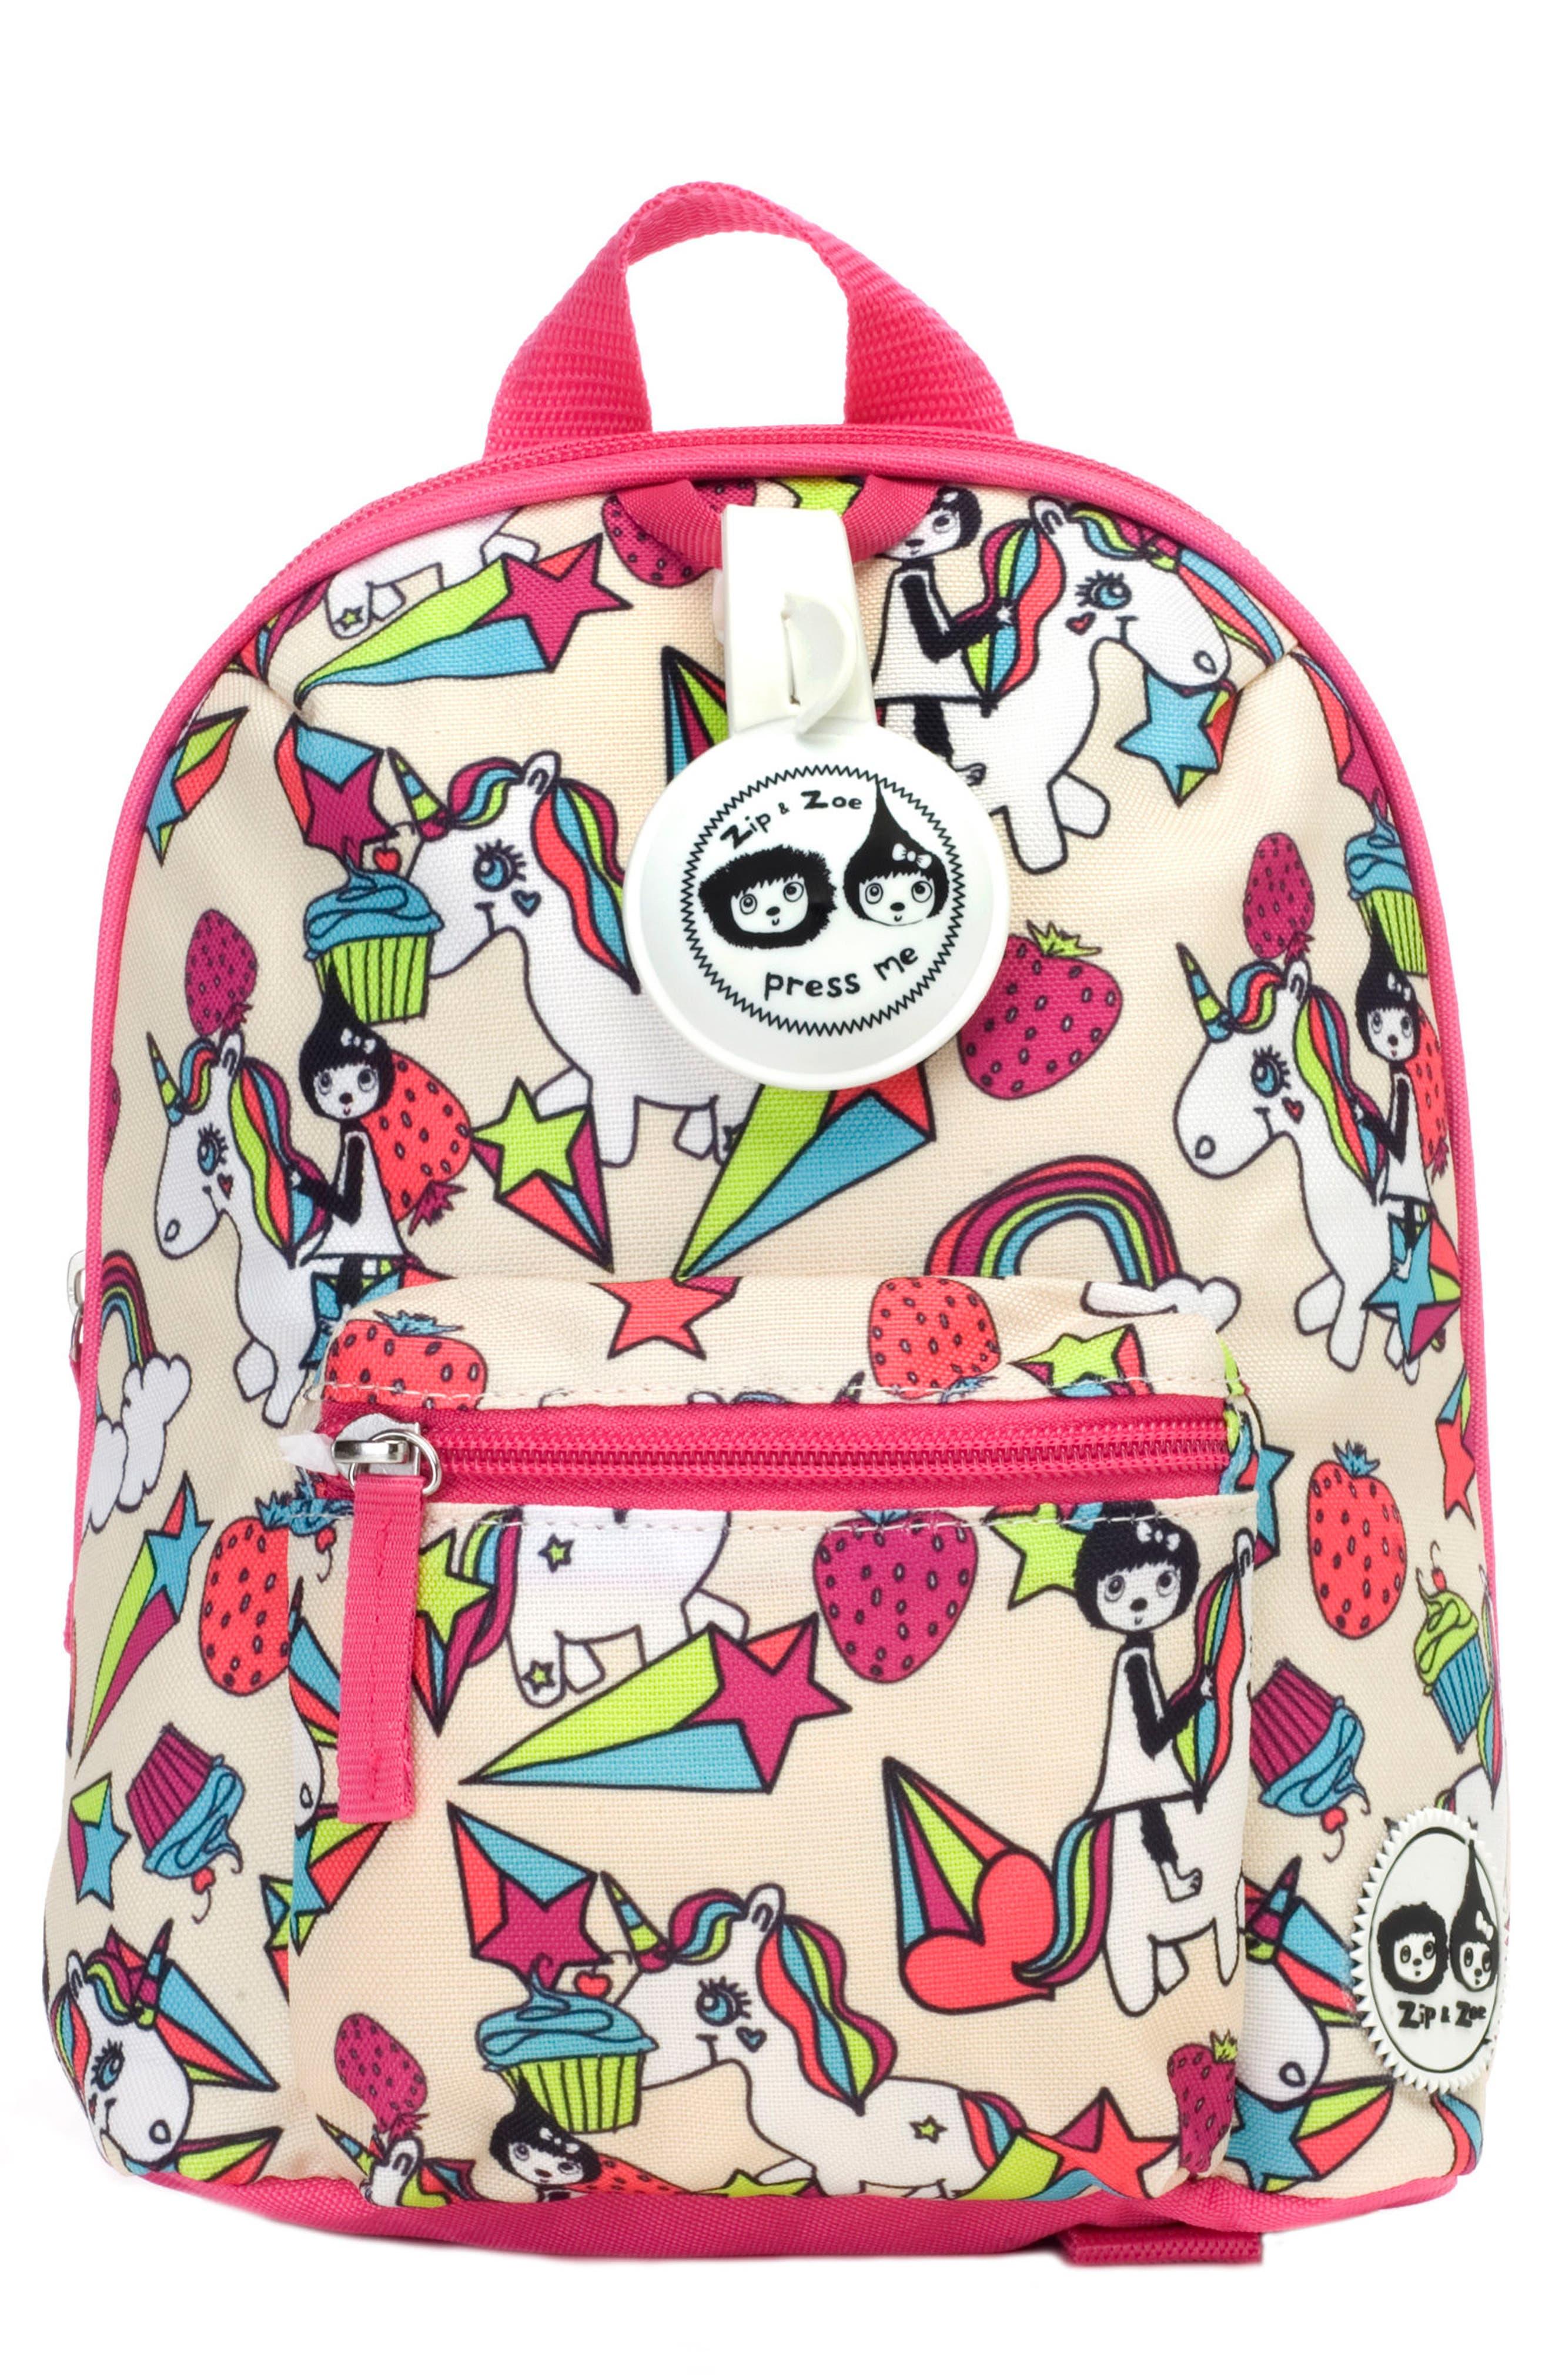 Zip & Zoe Unicorn Mini Backpack,                             Main thumbnail 1, color,                             Unicorn